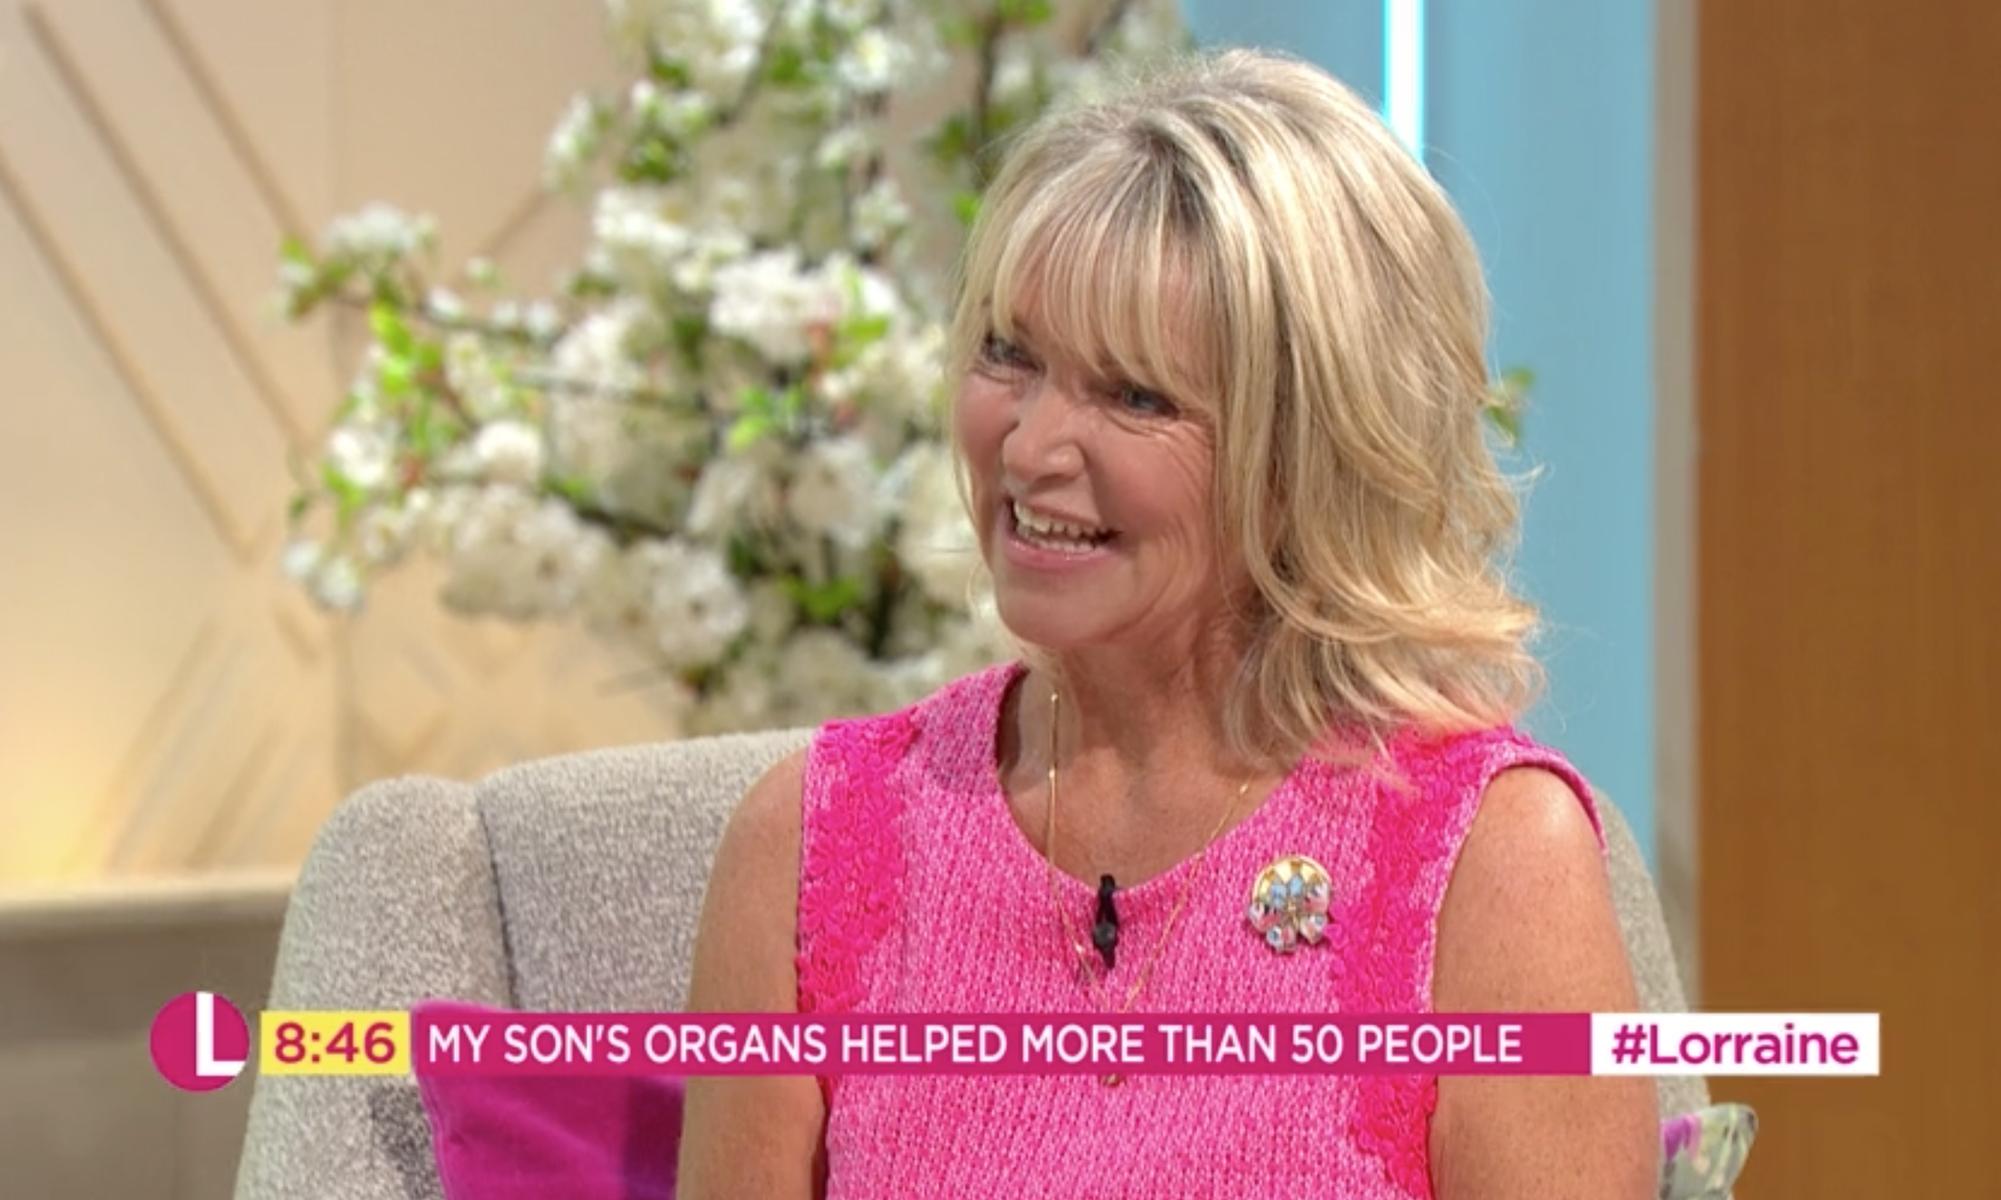 Amazing press coverage for Transplant Sport, British Transplant Games, and the World Transplant Games